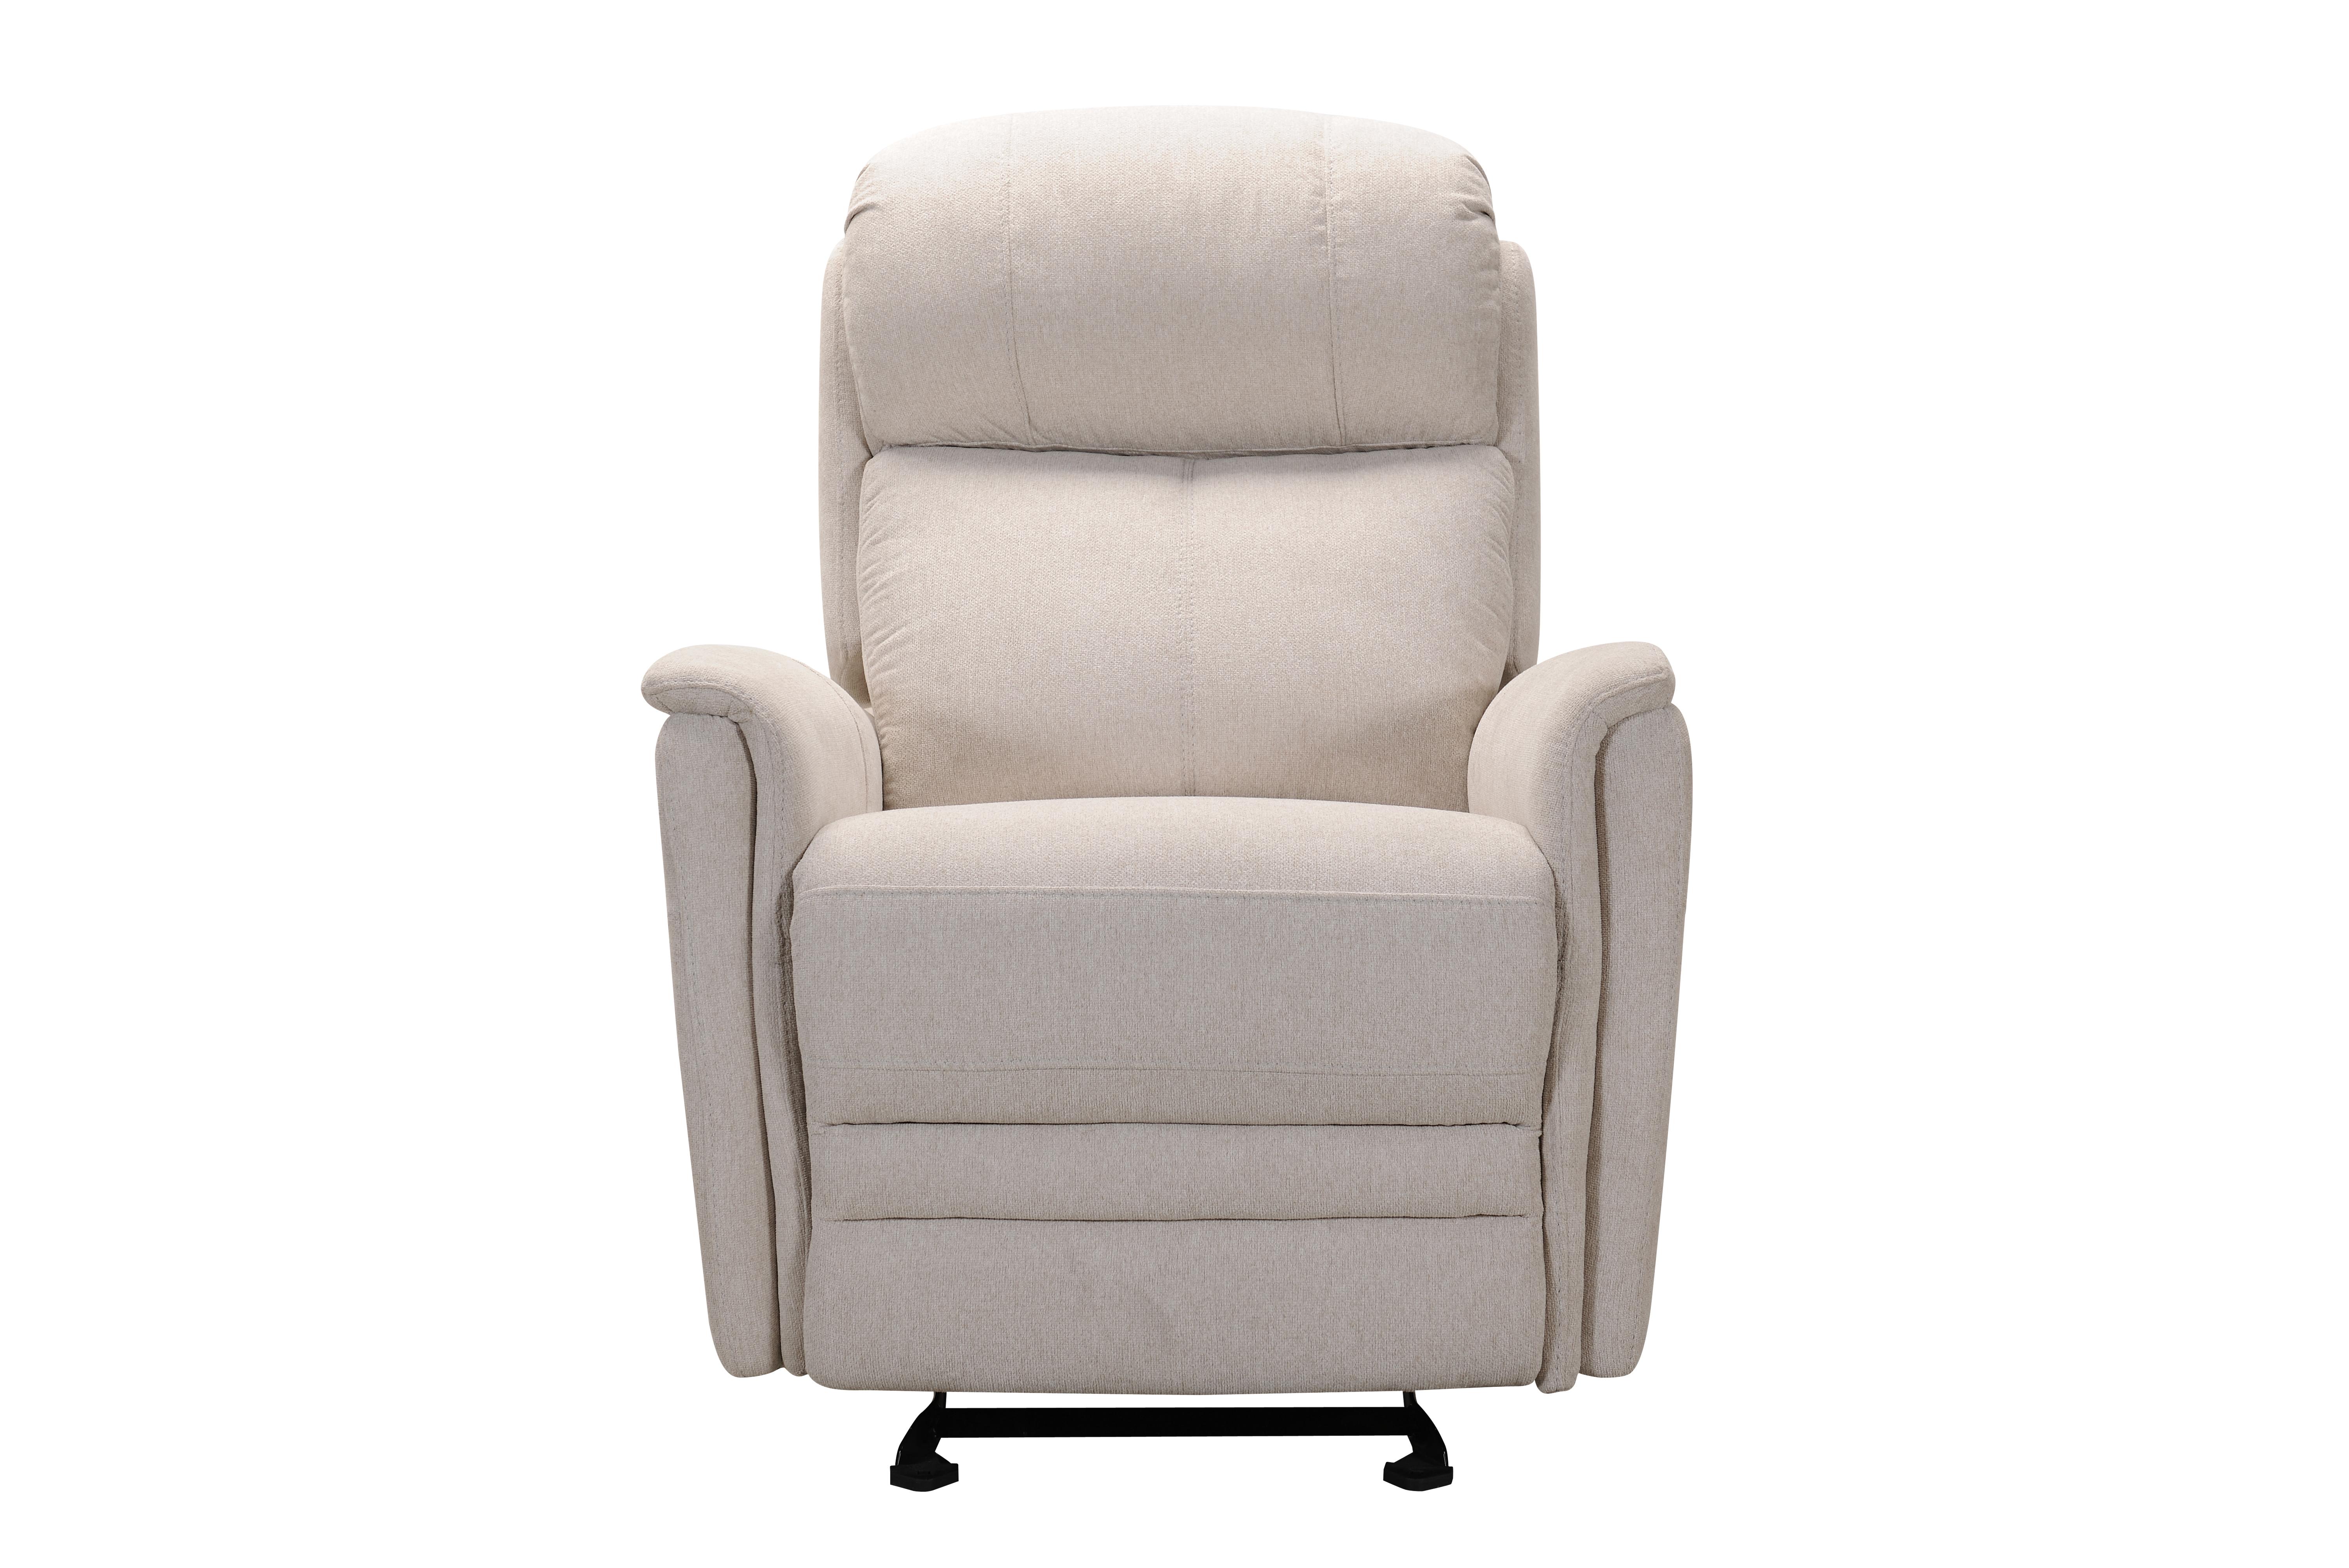 Natuzzi Leather Sofa With Chaise